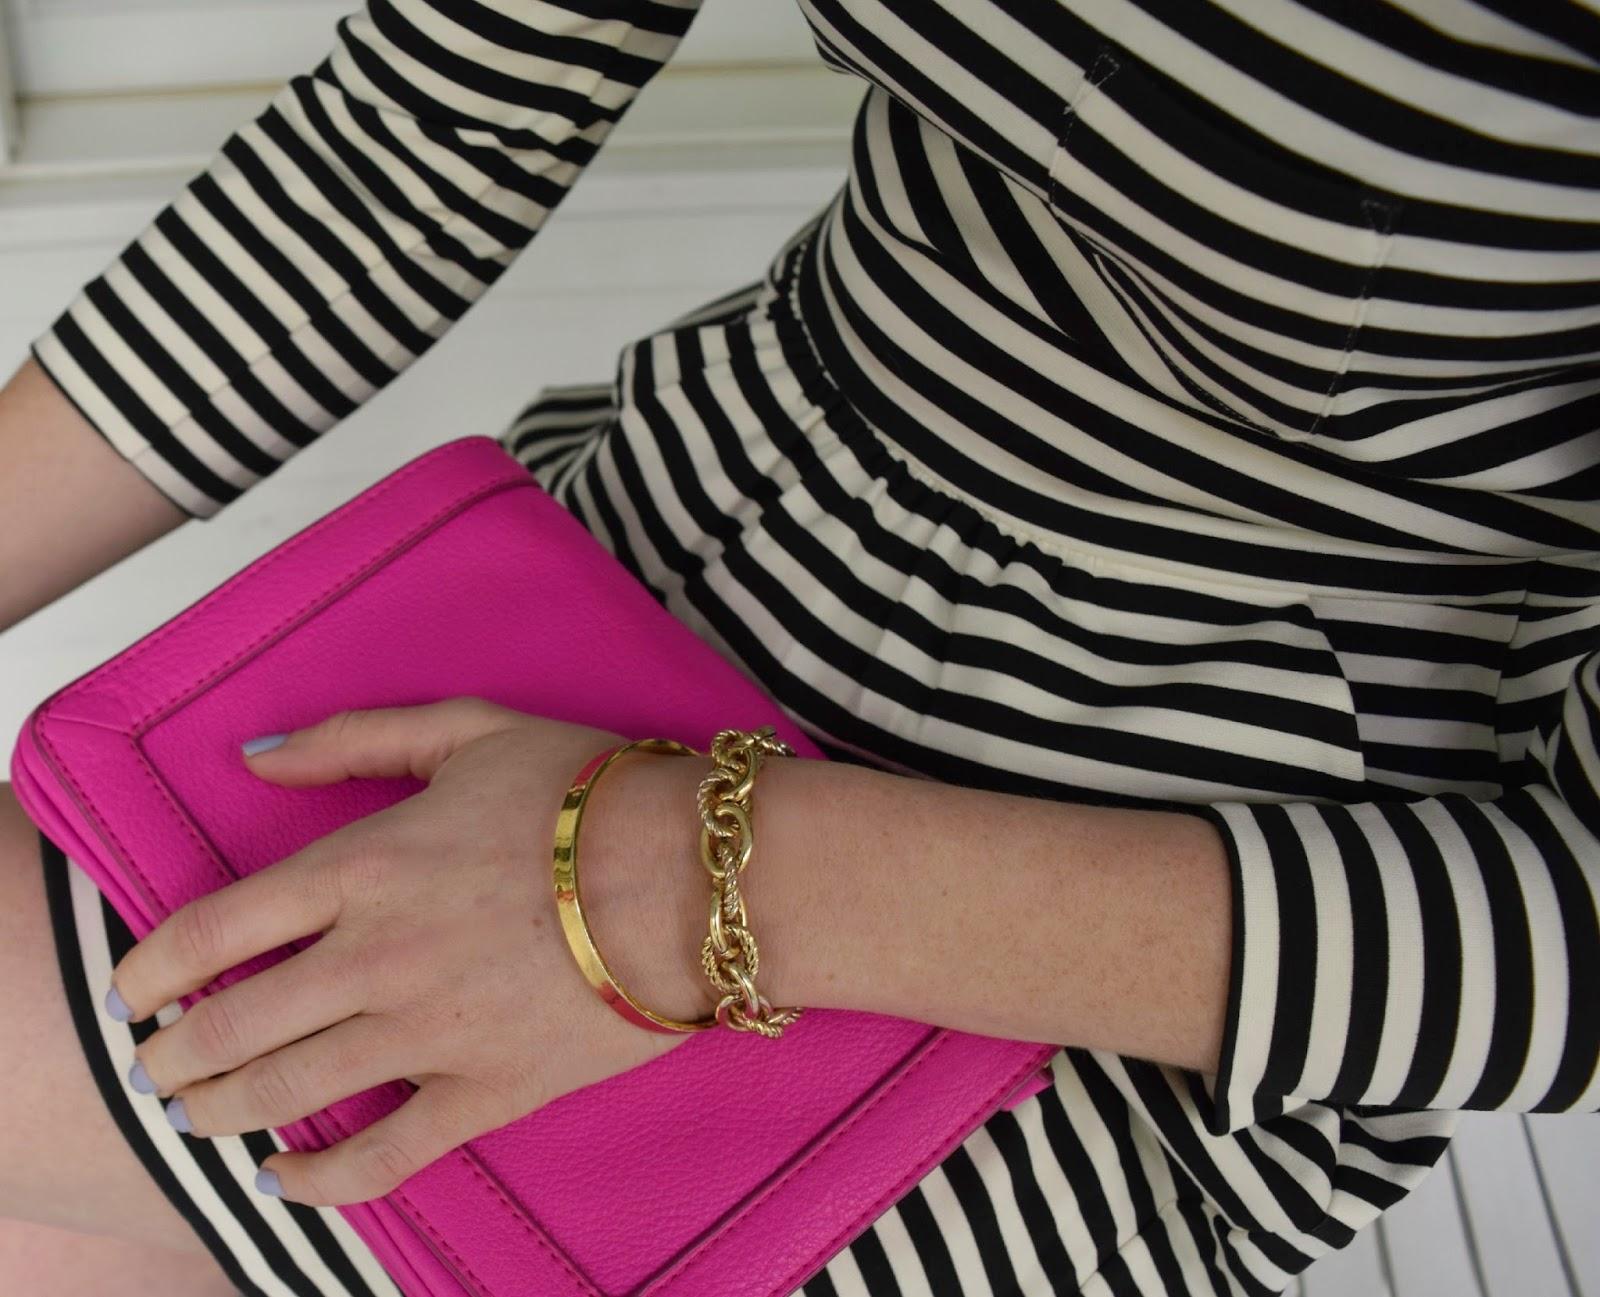 factory pocket dress in stripe - j.crew striped dress - black and white striped dress - pink purse - kate spade bracelet